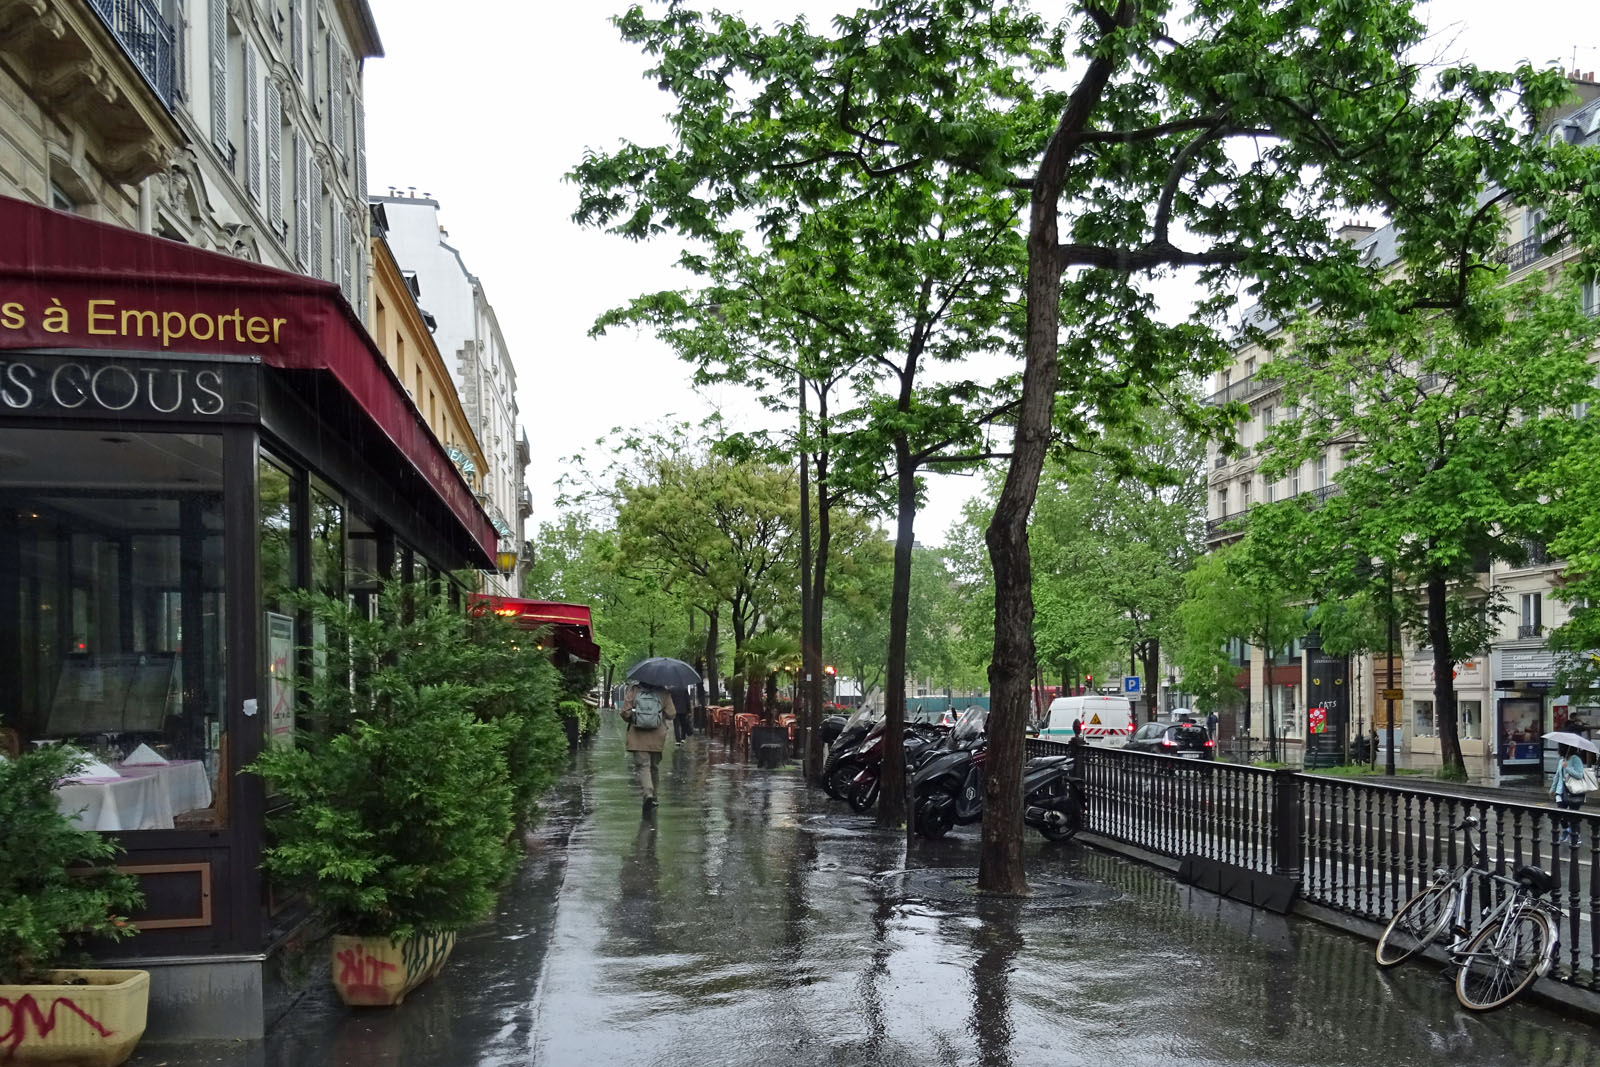 10 Dauerregen am Sonntag Vormittag